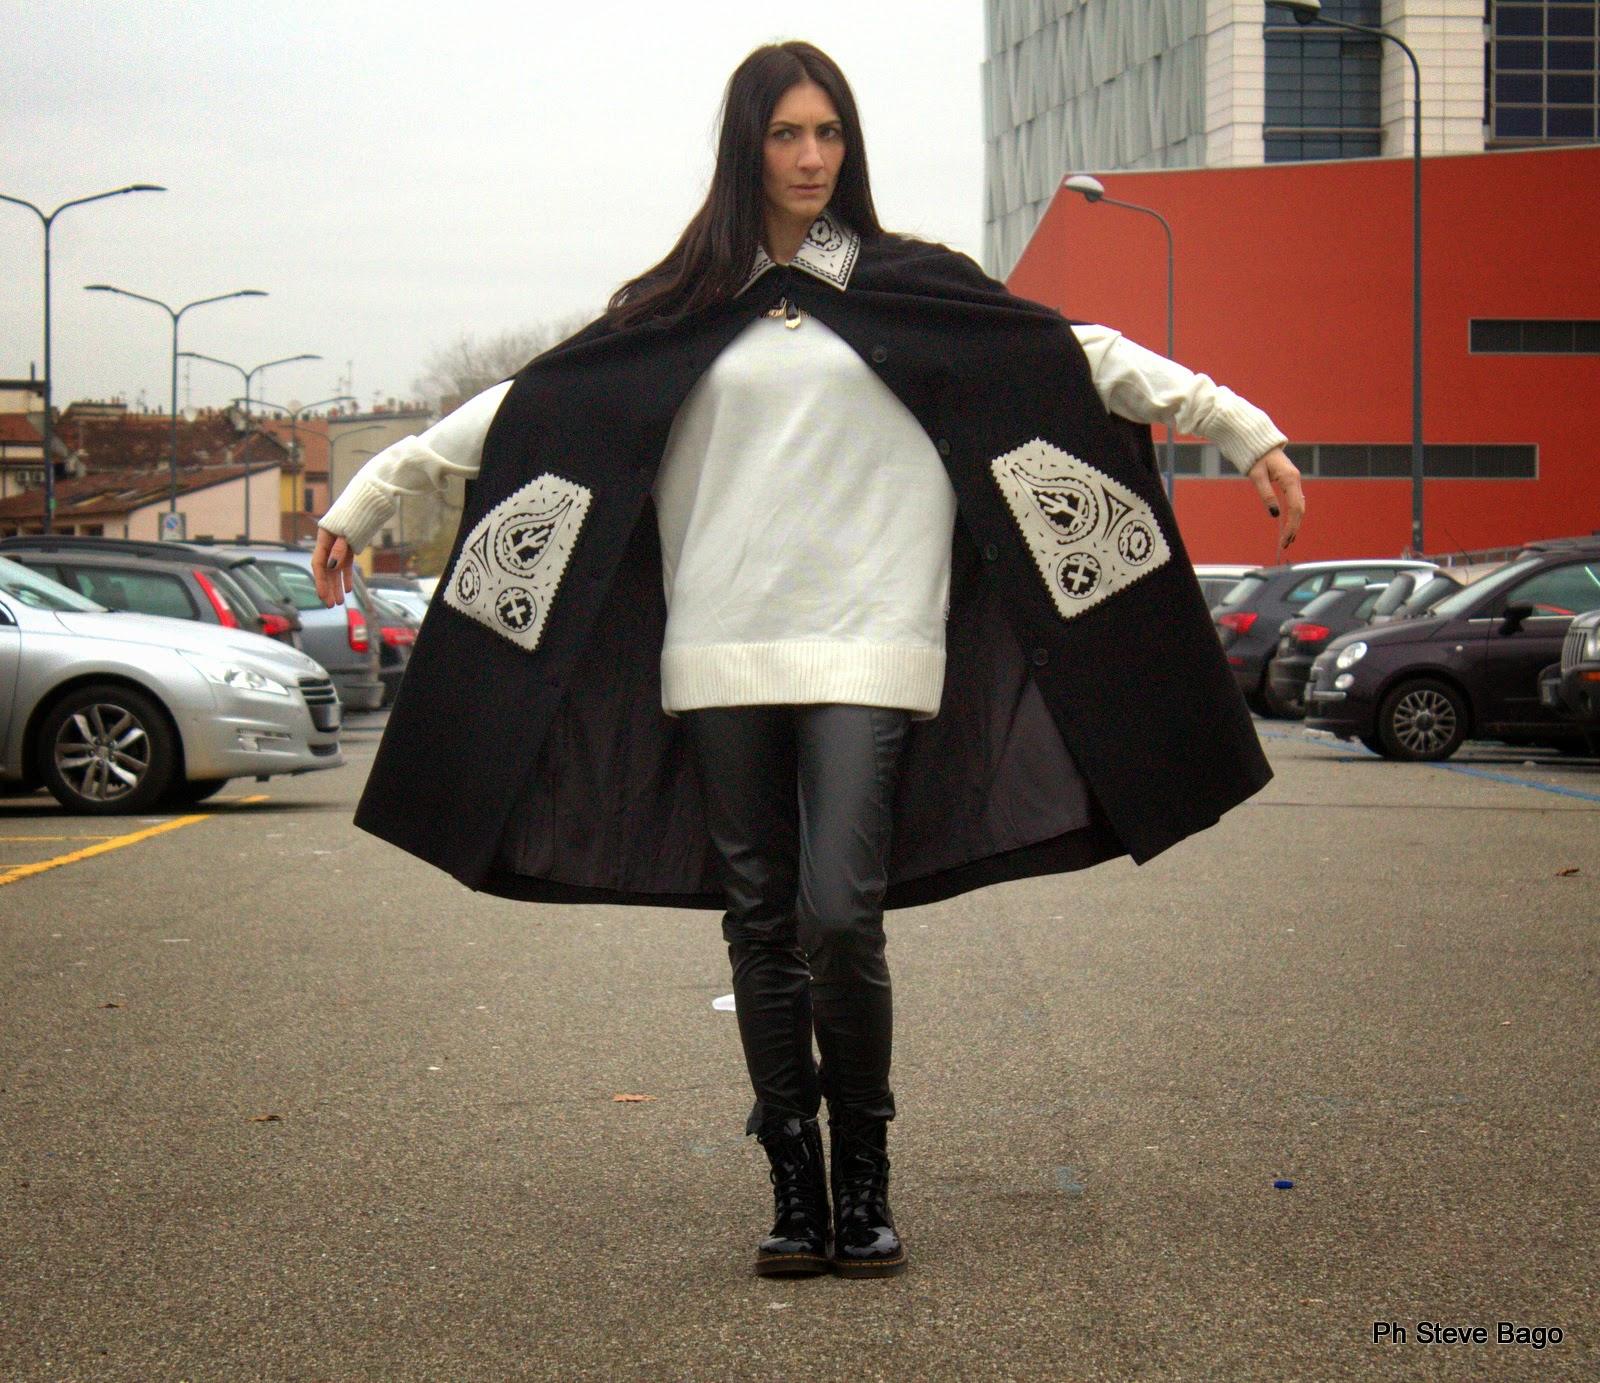 themorasmoothie, fashion, fashionblog, fashionblogger, ivanahelsinki, capa, dr martens, ivana helsinki, fashion, outfit, ootd, look, themorasmoothieoutfit, lookoftheday, outfittheday, shopping, shopping on line, moda, mode, blogger, italianblogger, italianfashionblogger, girl, me, model